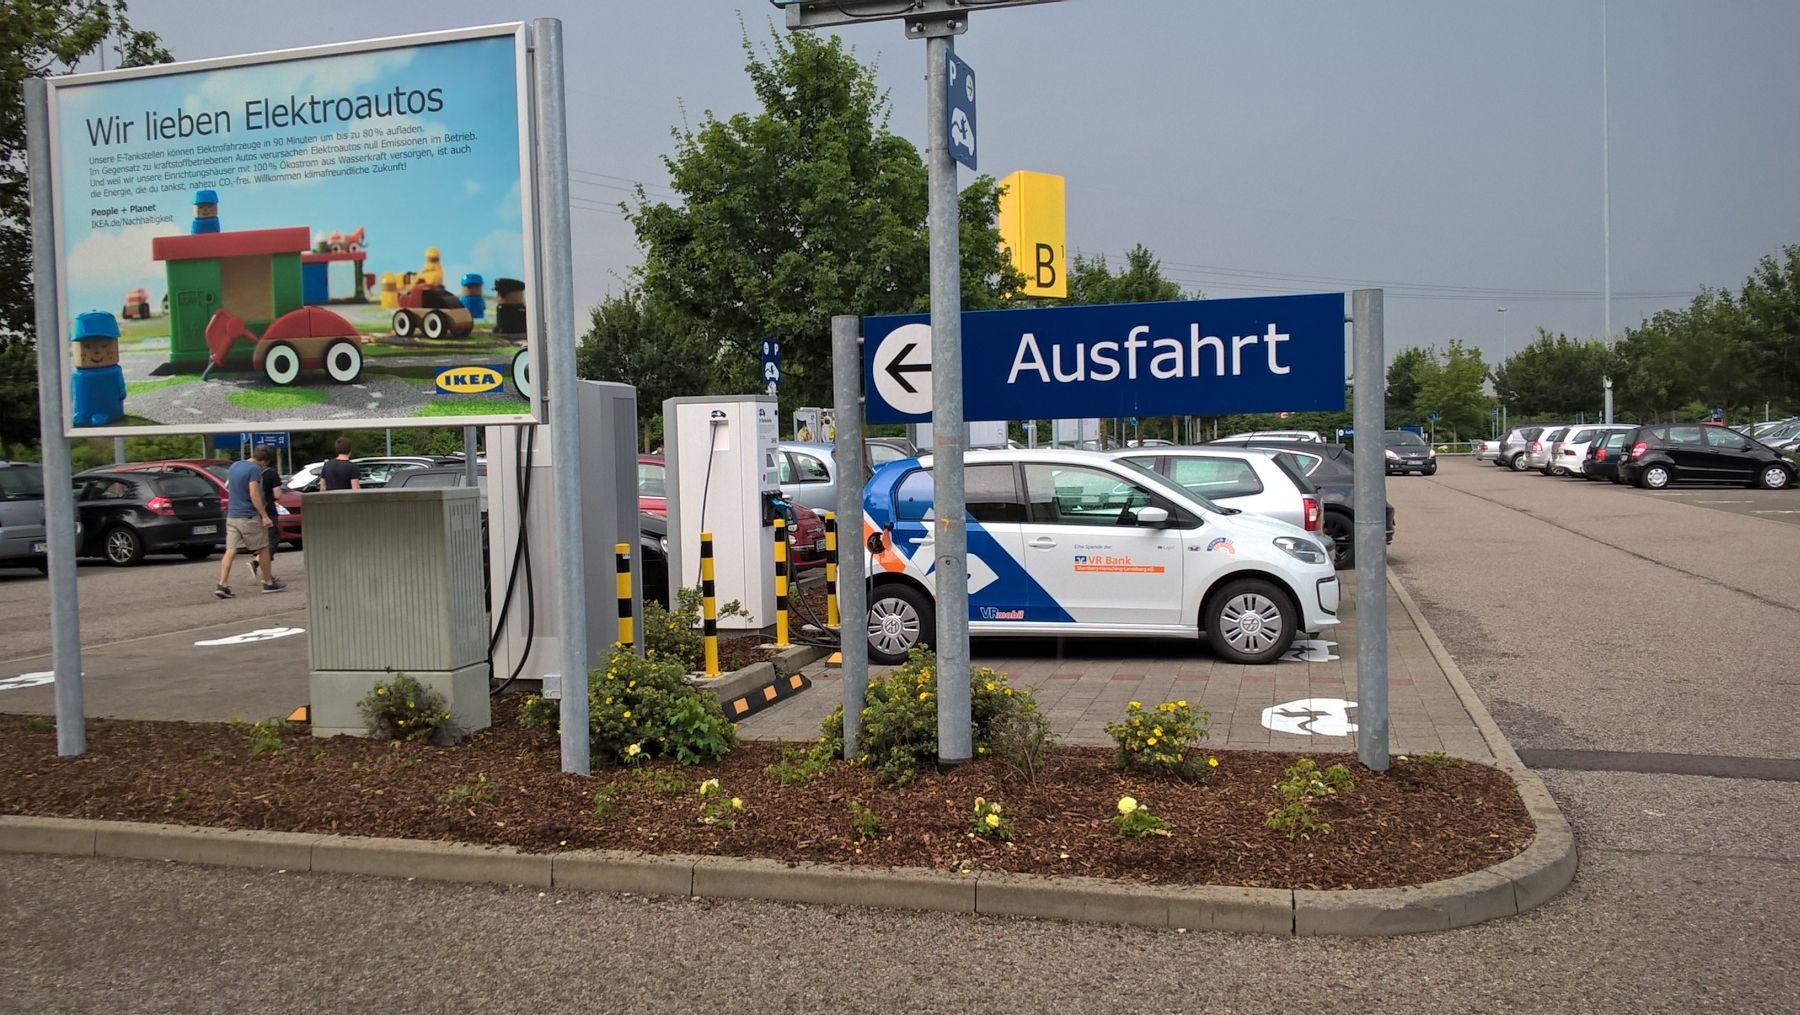 elektroauto ladestation in augsburg b17 ikea deutschland. Black Bedroom Furniture Sets. Home Design Ideas